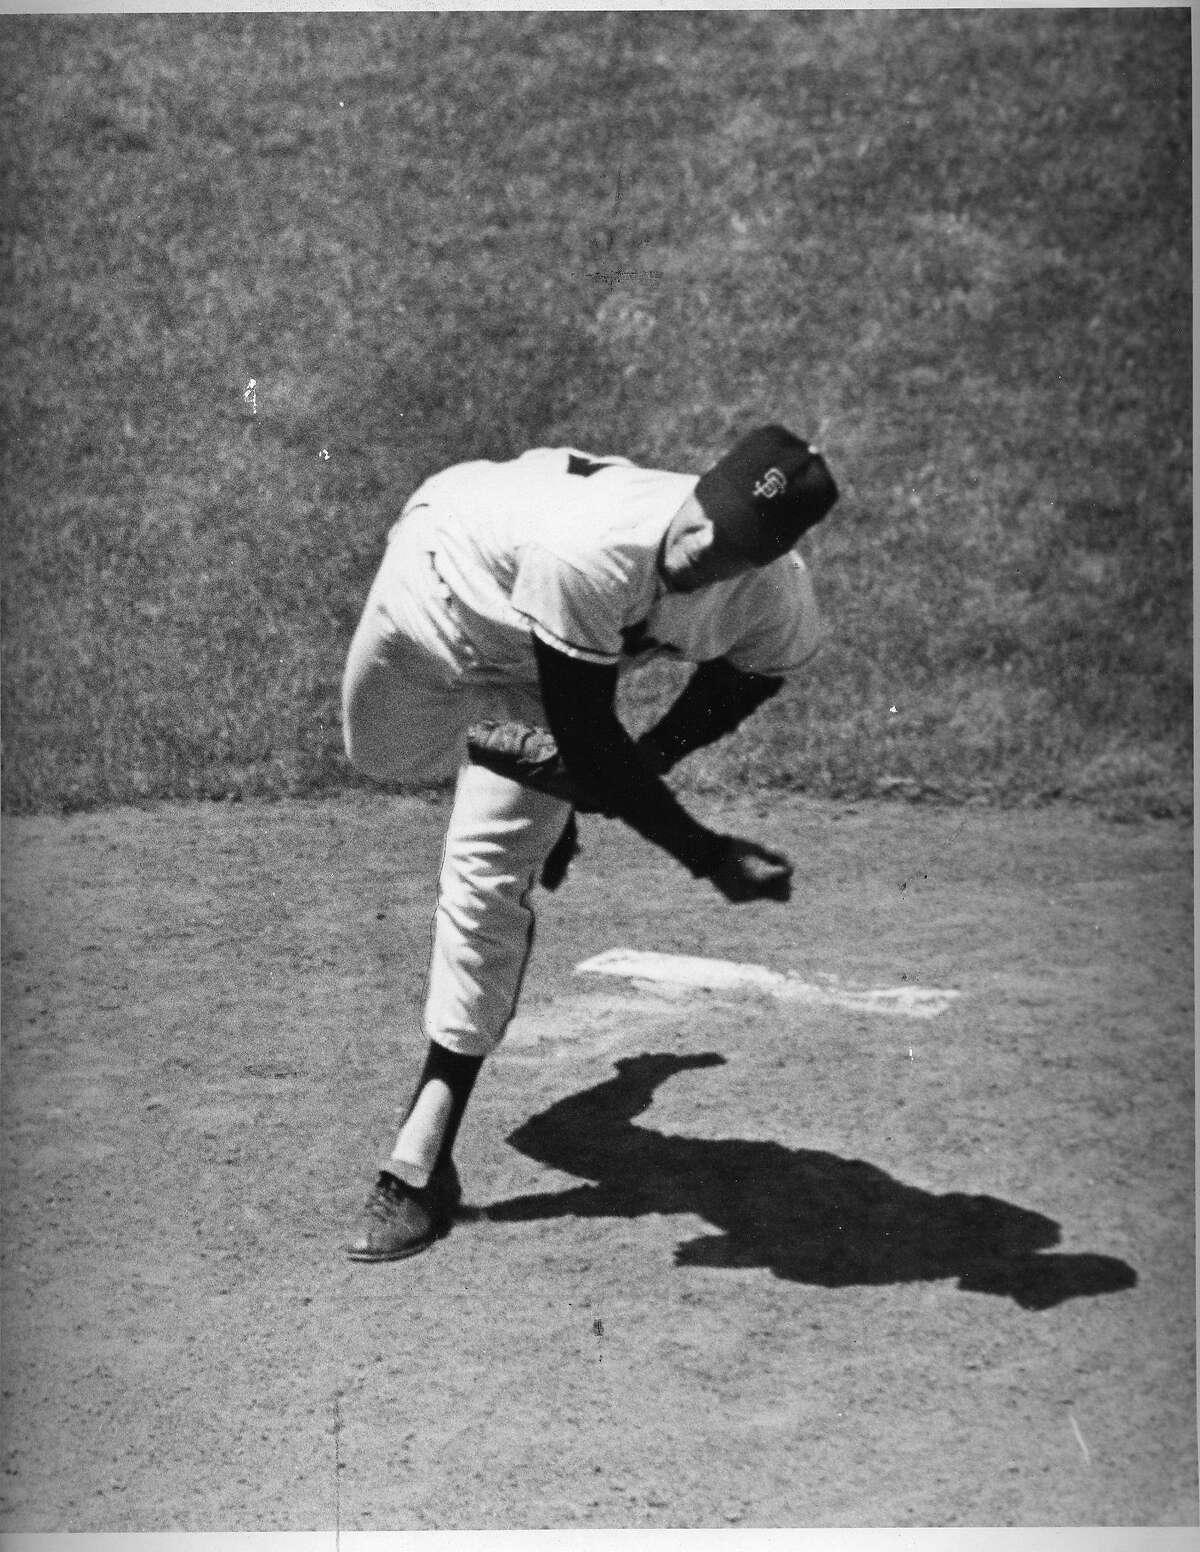 Juan Marichal pitches no-hitter, 06/15/1963 photo ran 06/16/1963, Page 31